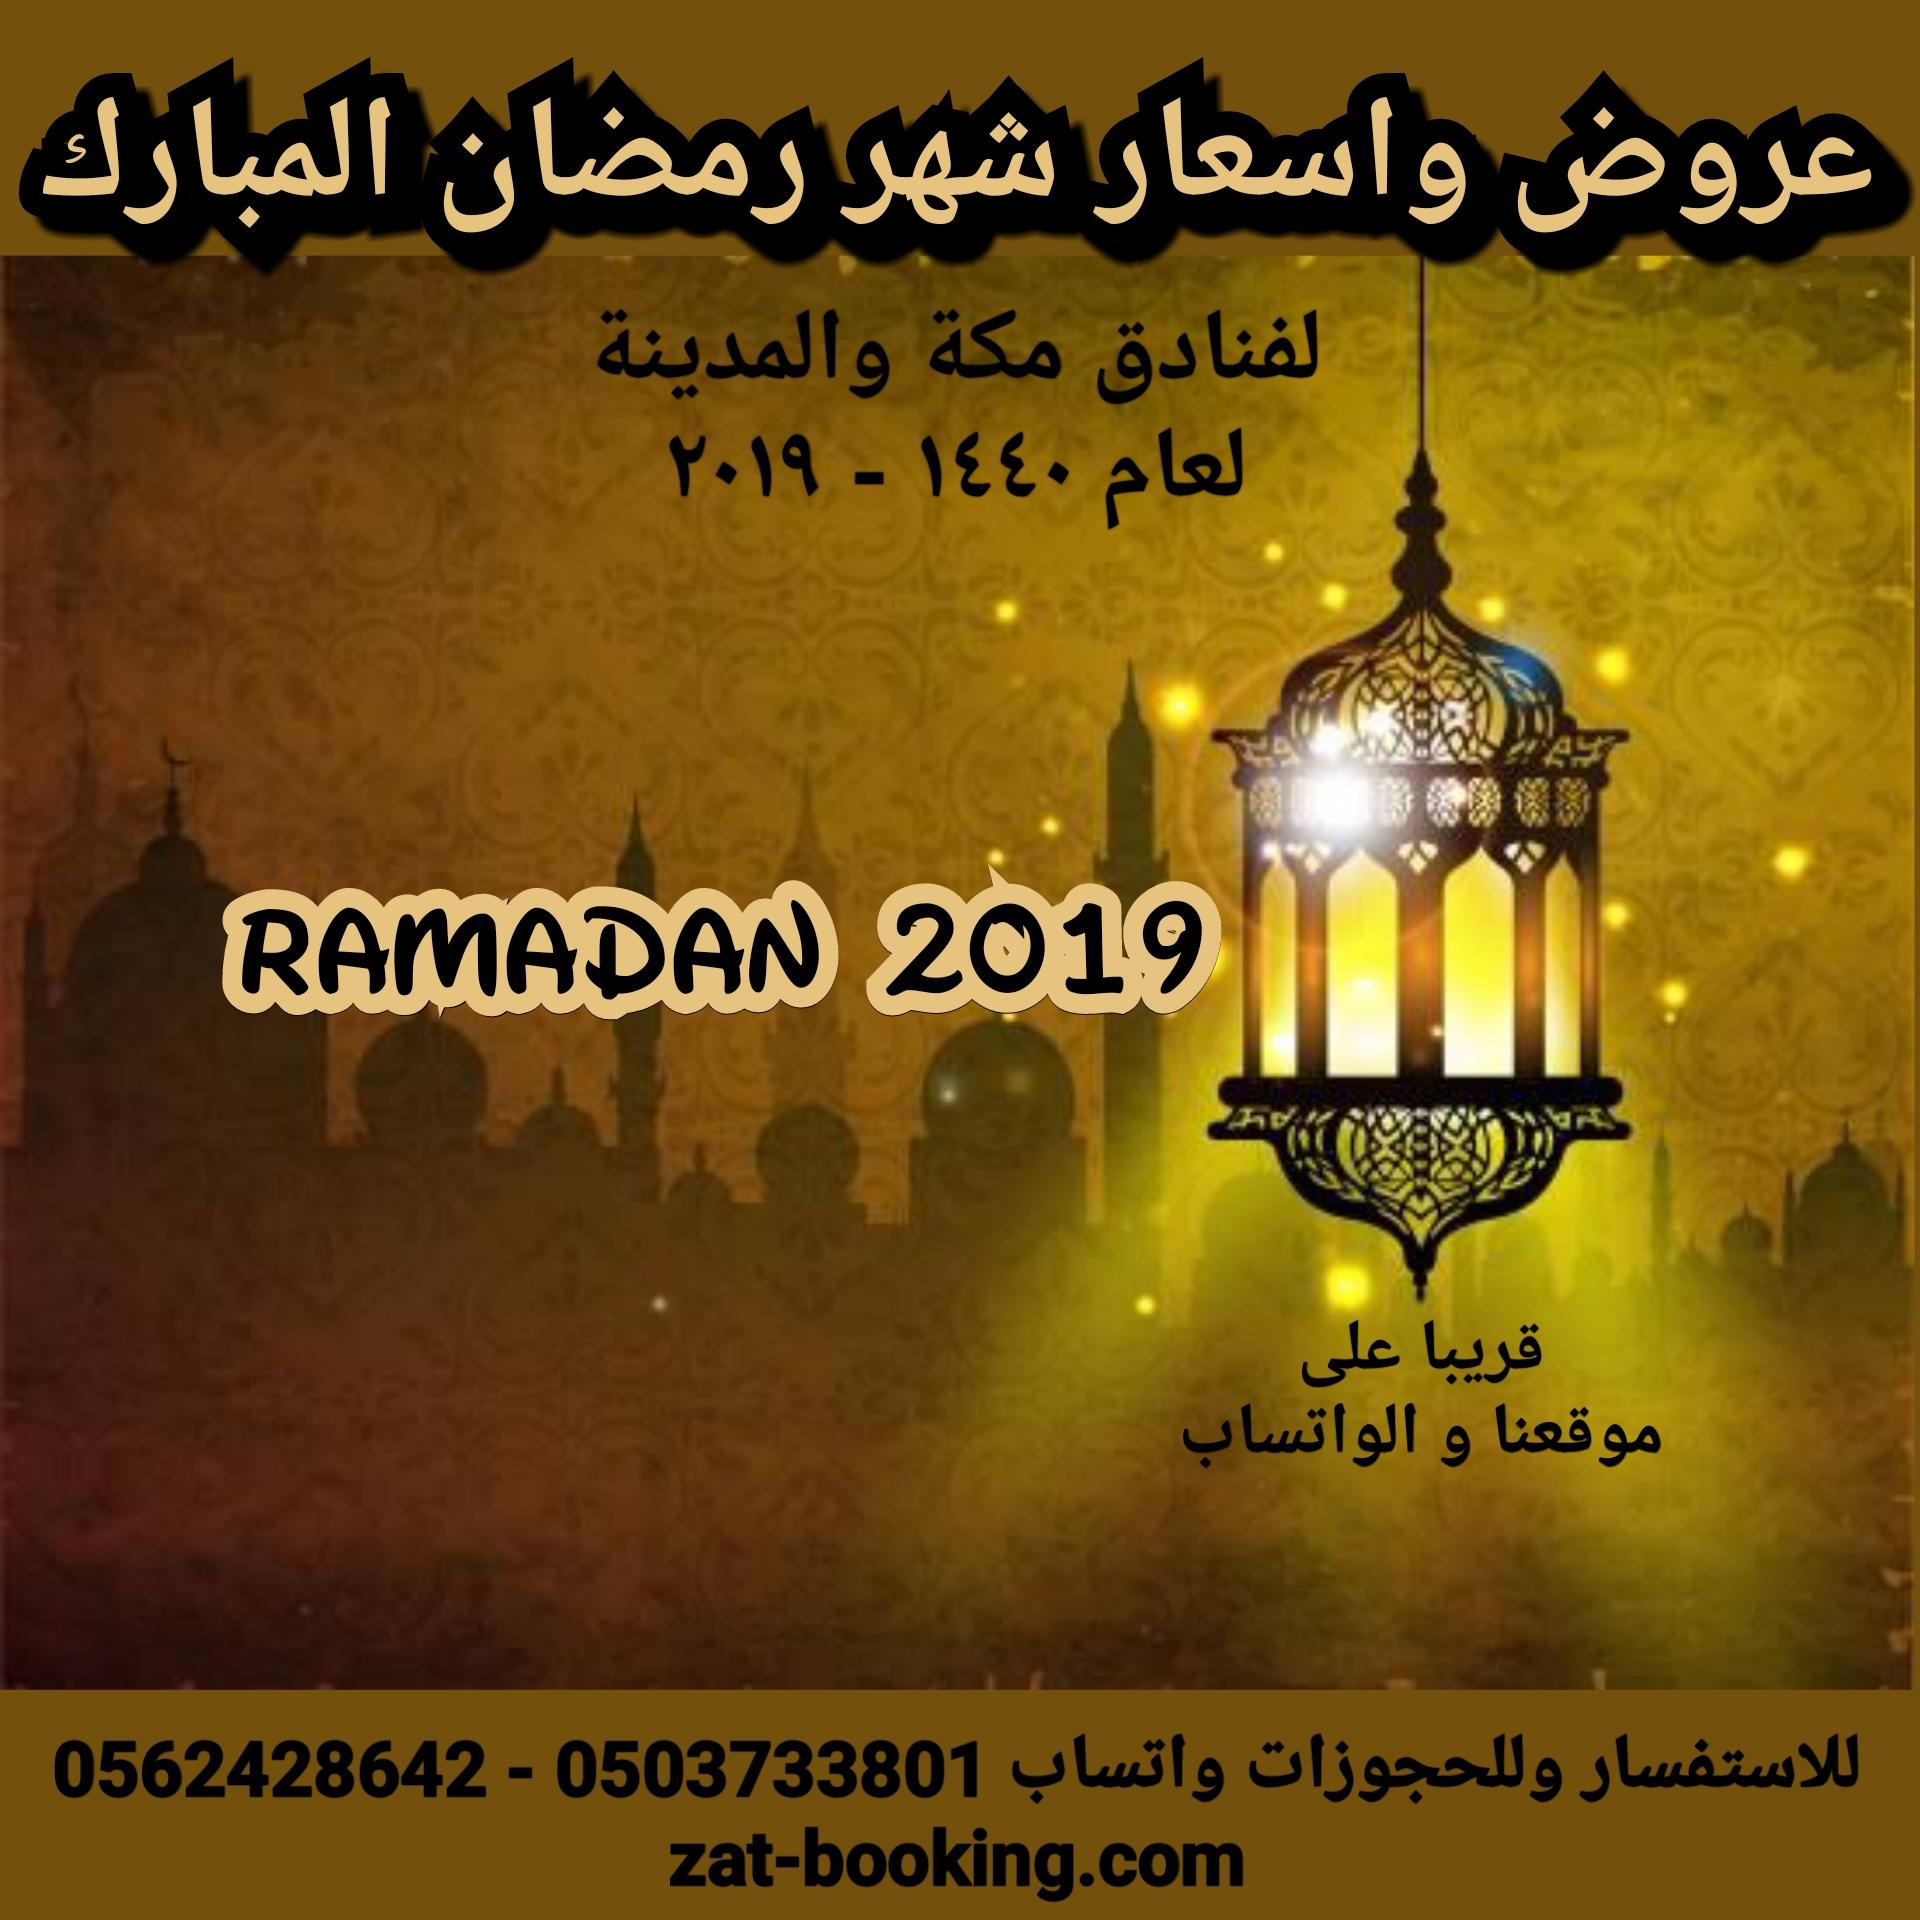 ramadan offers 2019